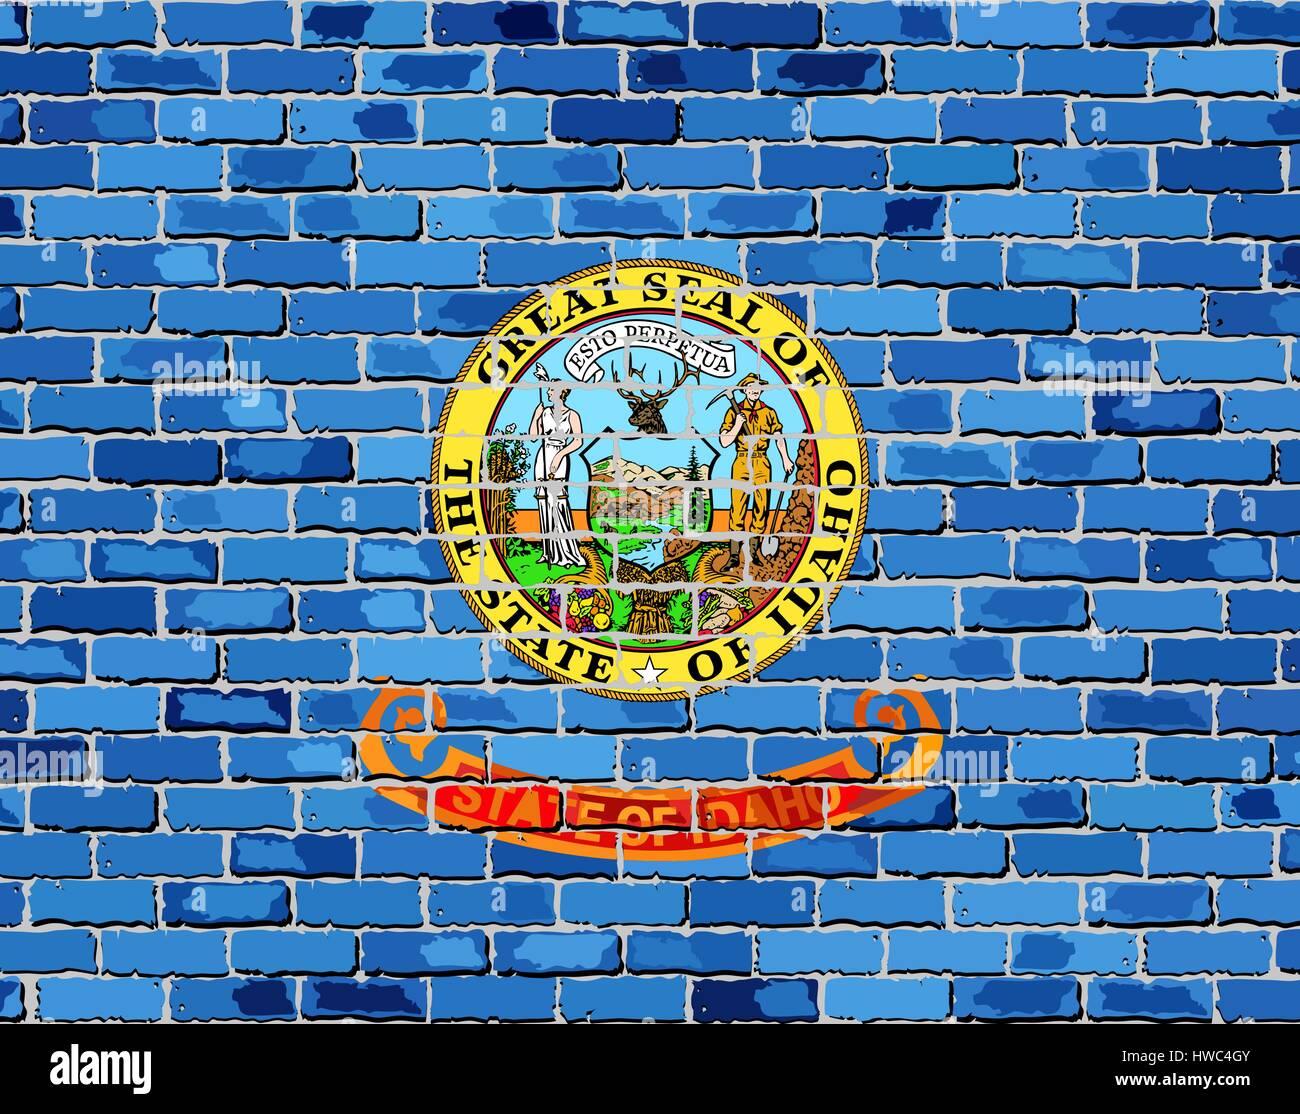 Flag of Idaho on a brick wall - Illustration,  The flag of the state of Idaho on brick background - Stock Vector